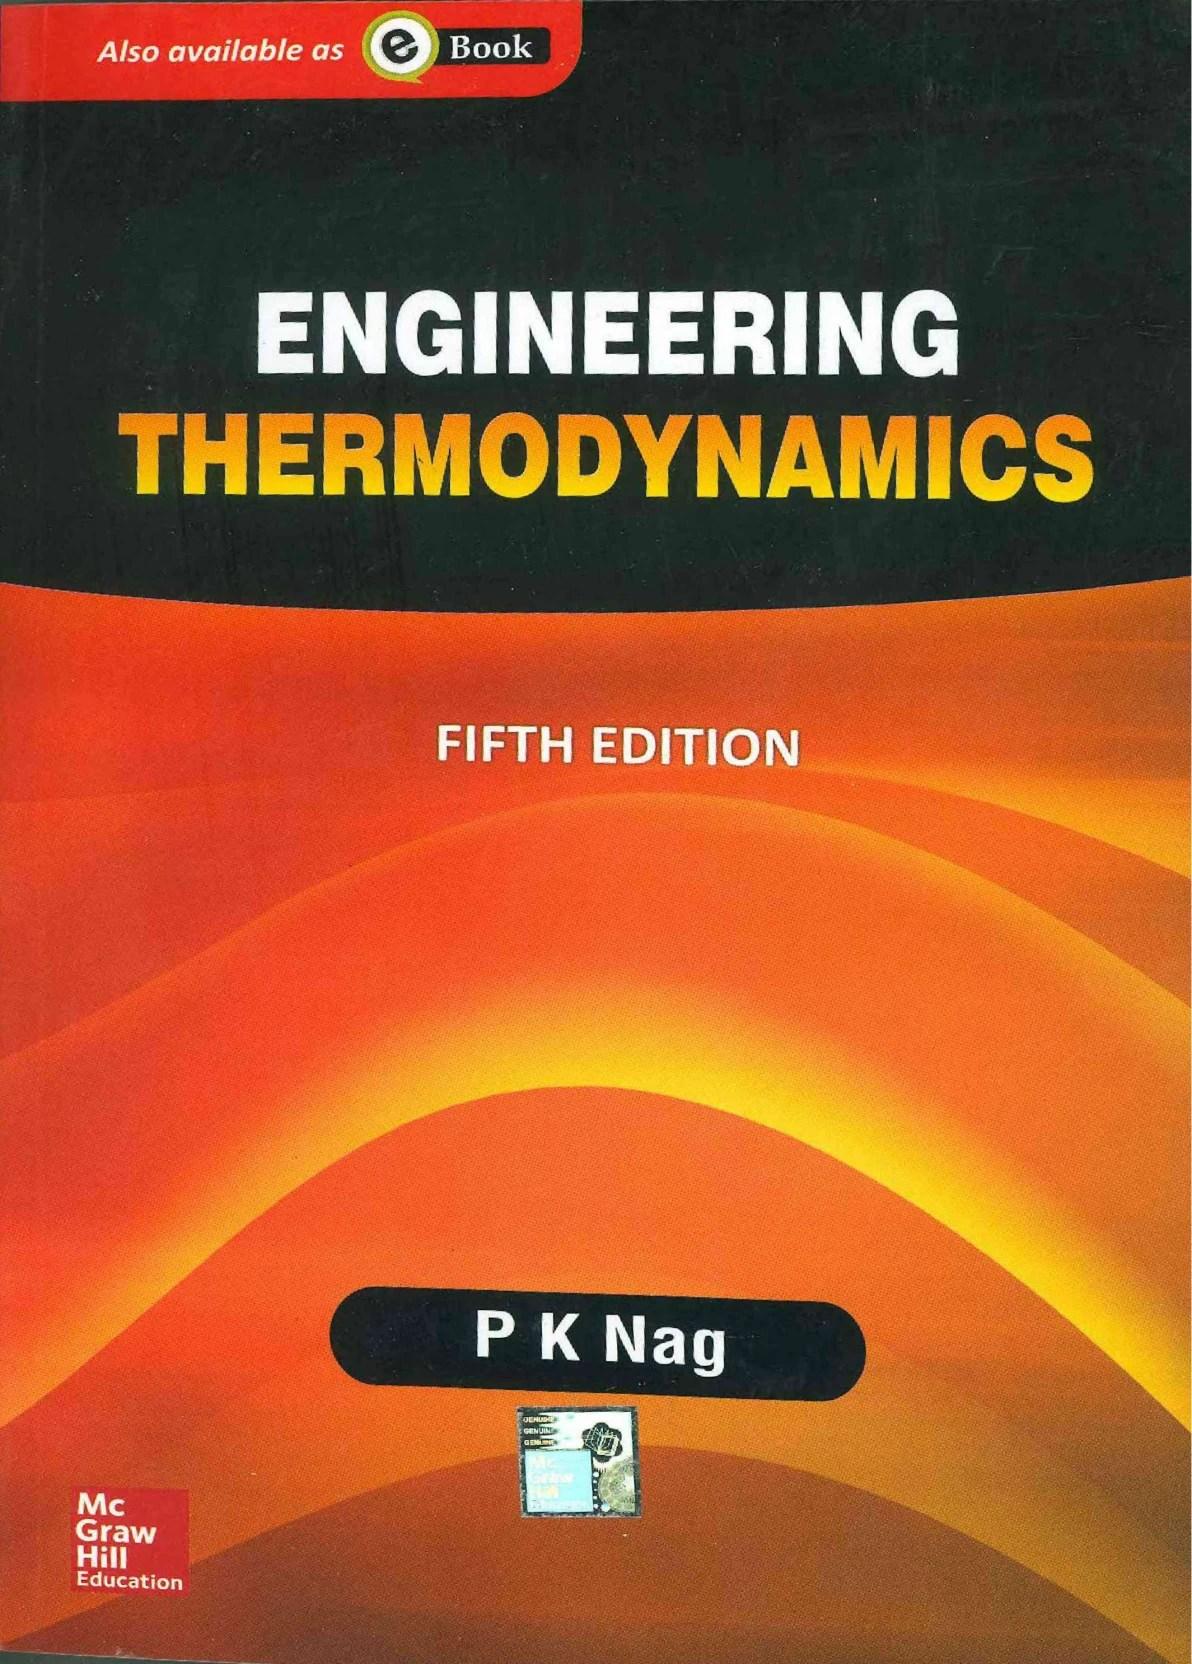 Engineering Thermodynamics Book